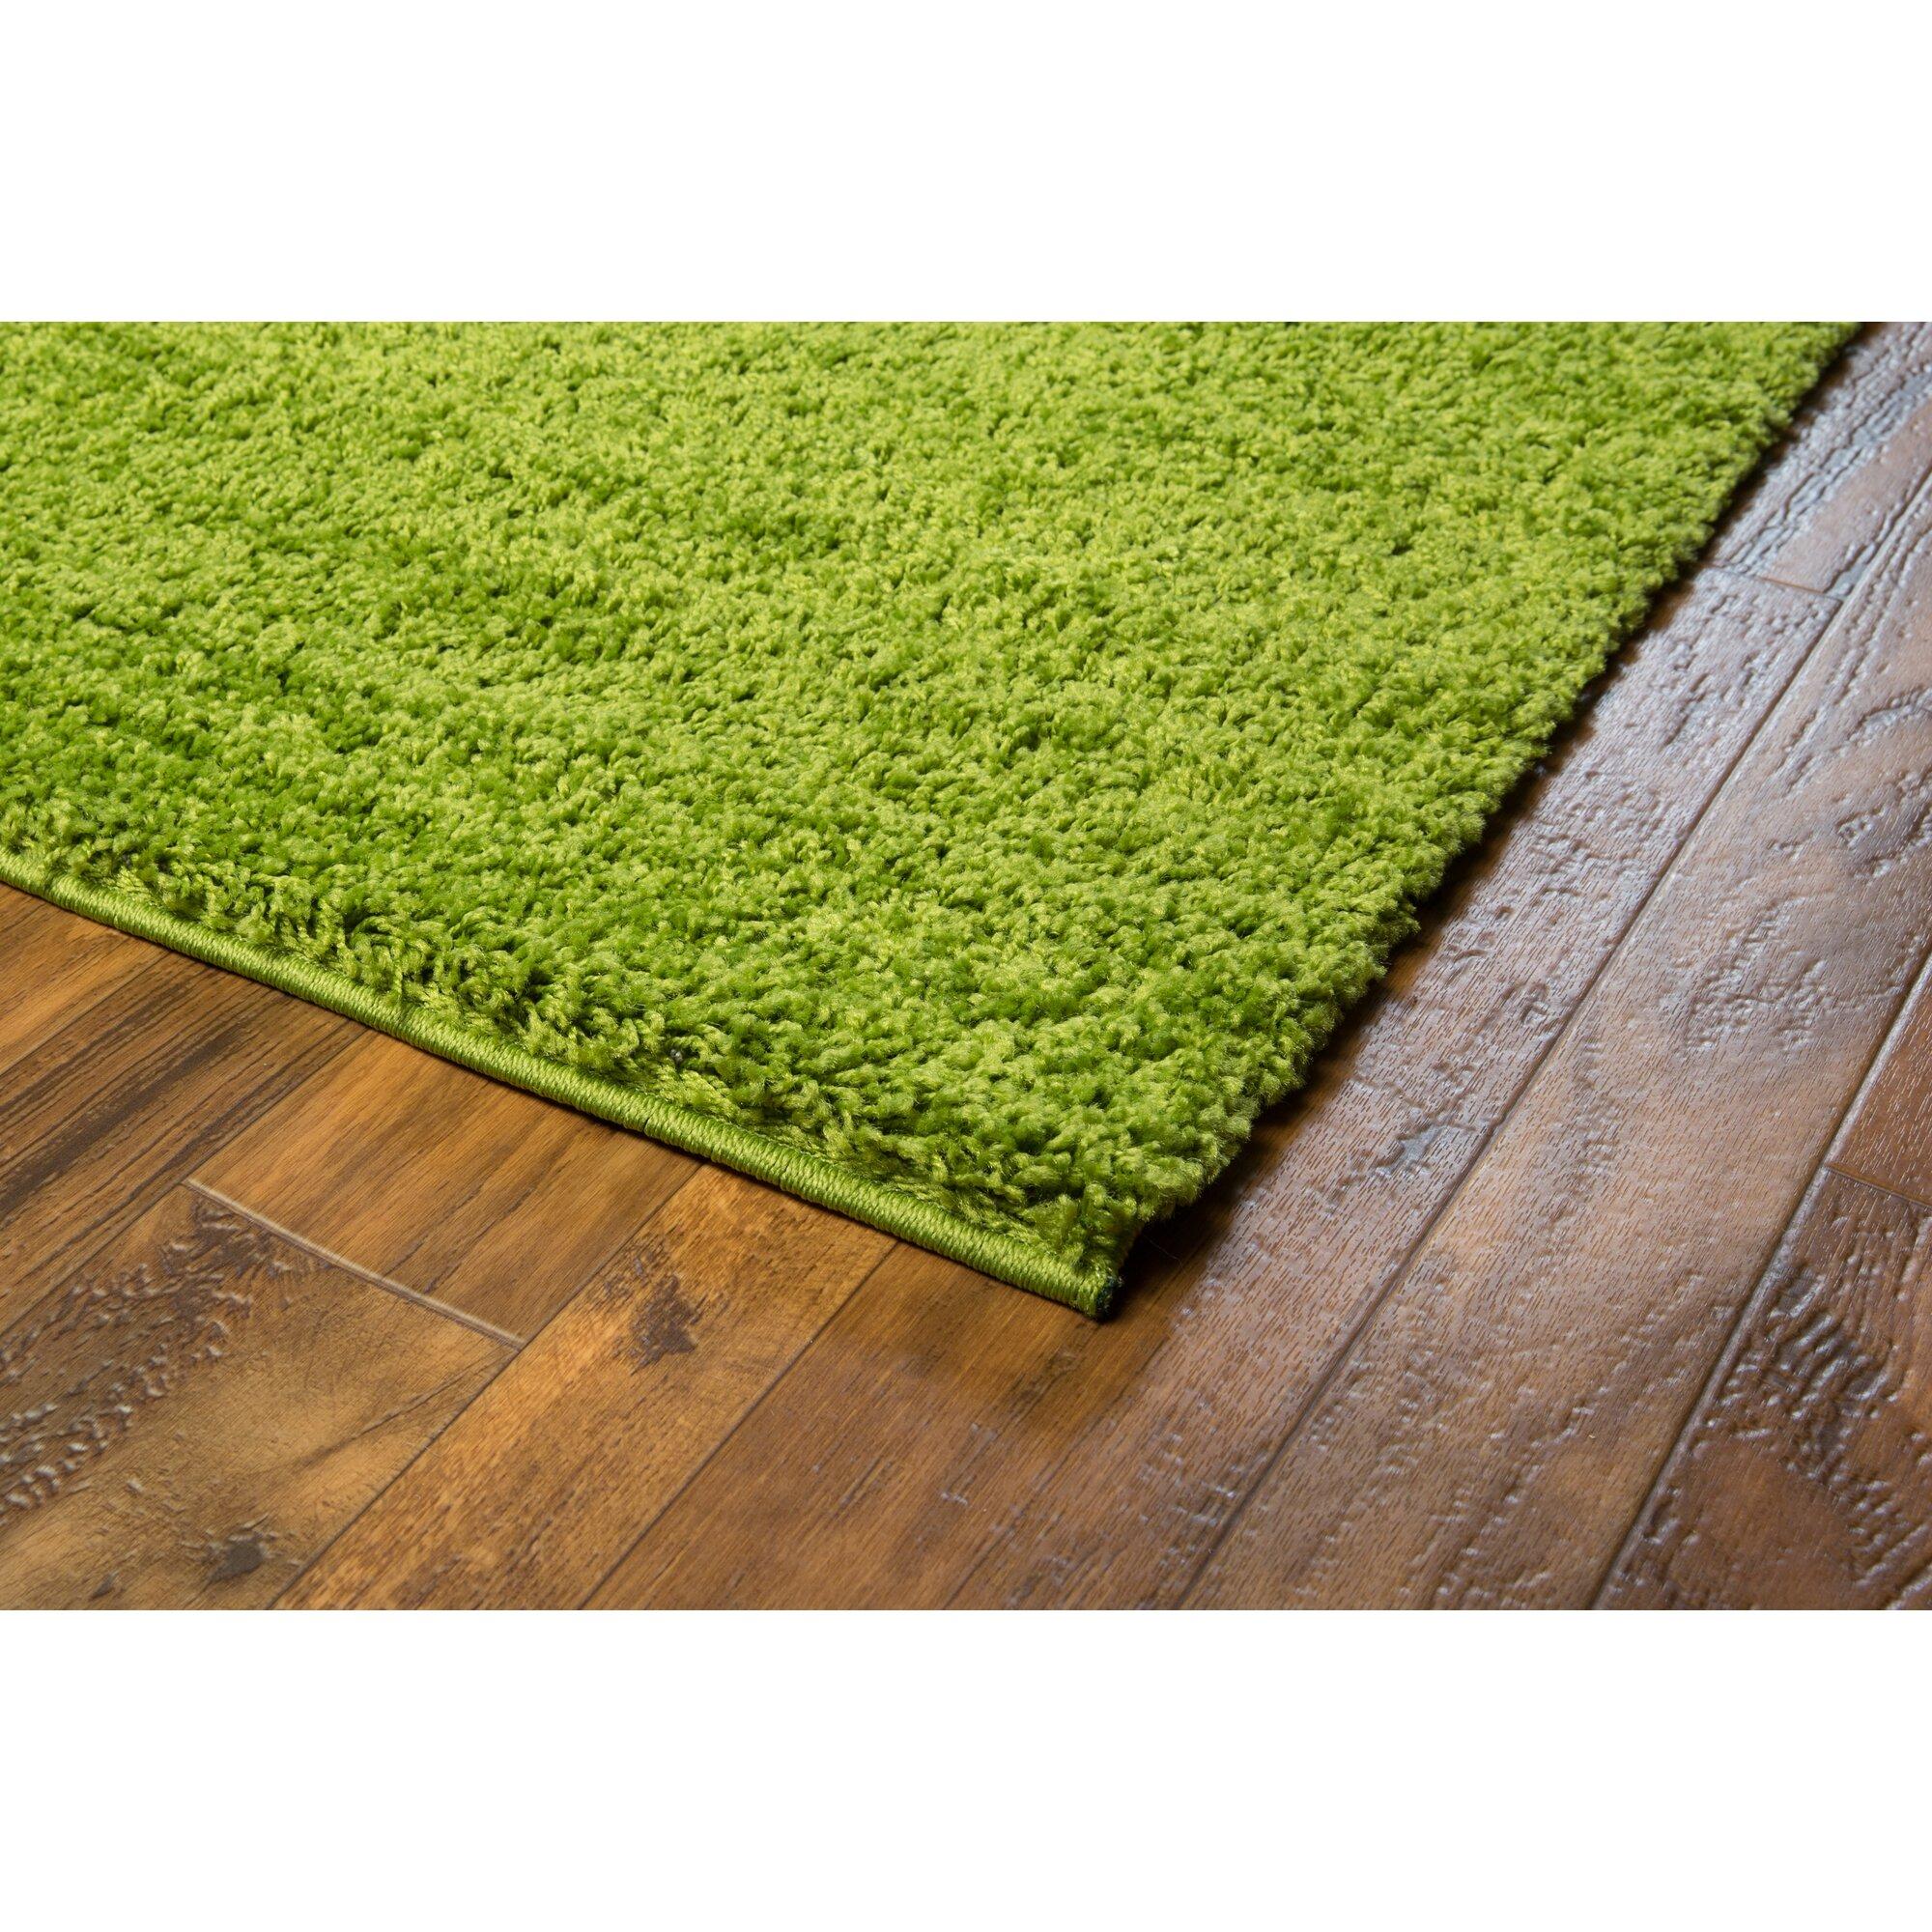 Zipcode Design Dante Plain Solid Green Area Rug & Reviews